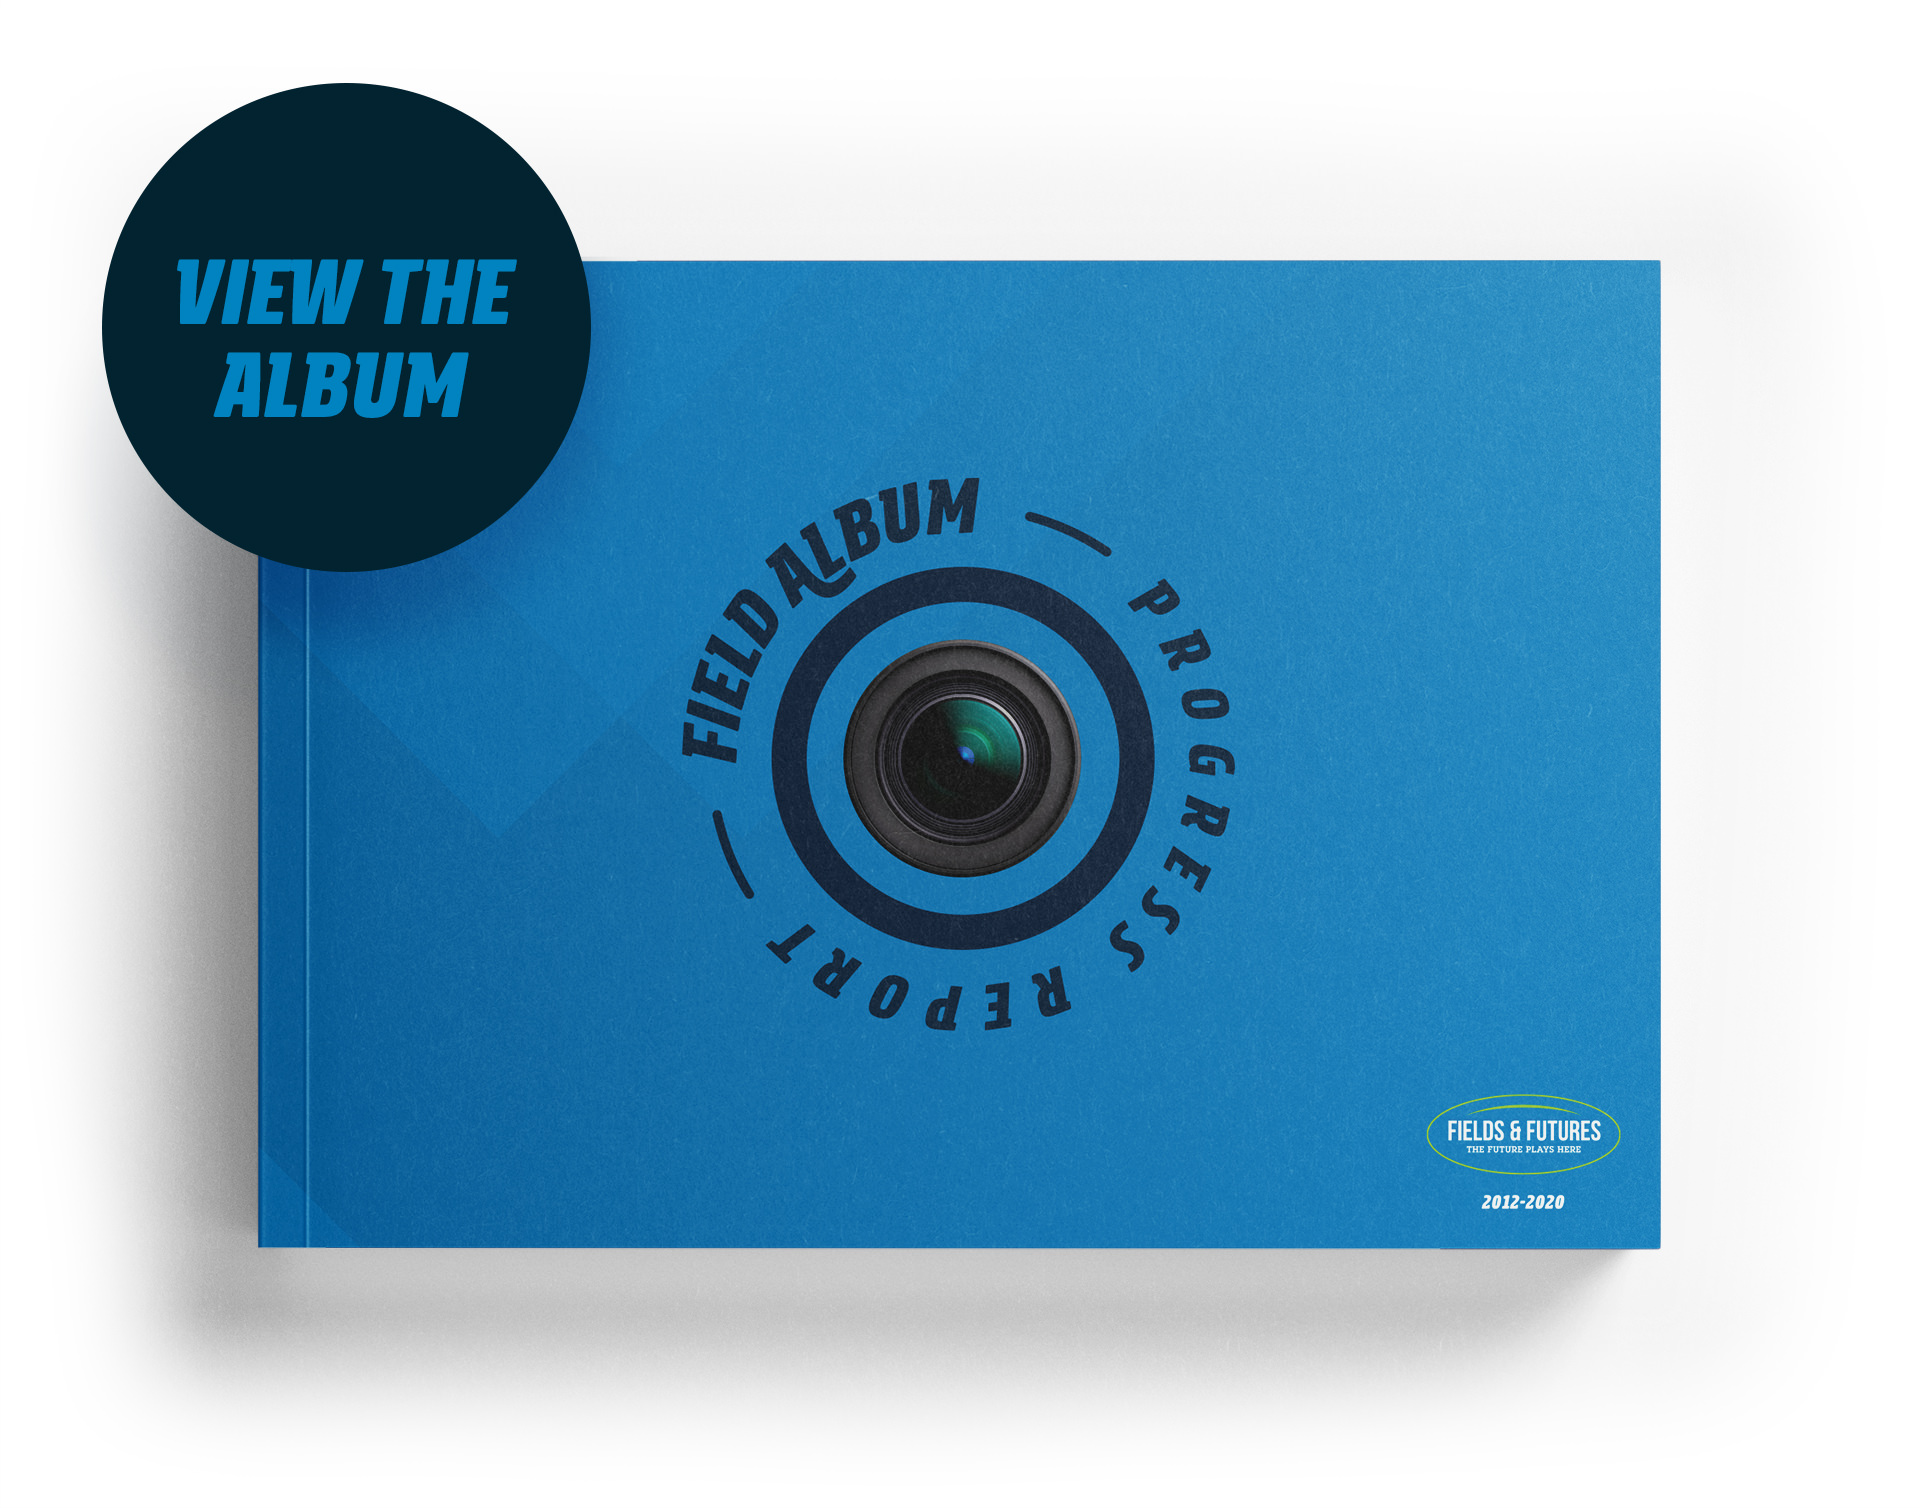 Fields and Futures Field Album Progress Report Book